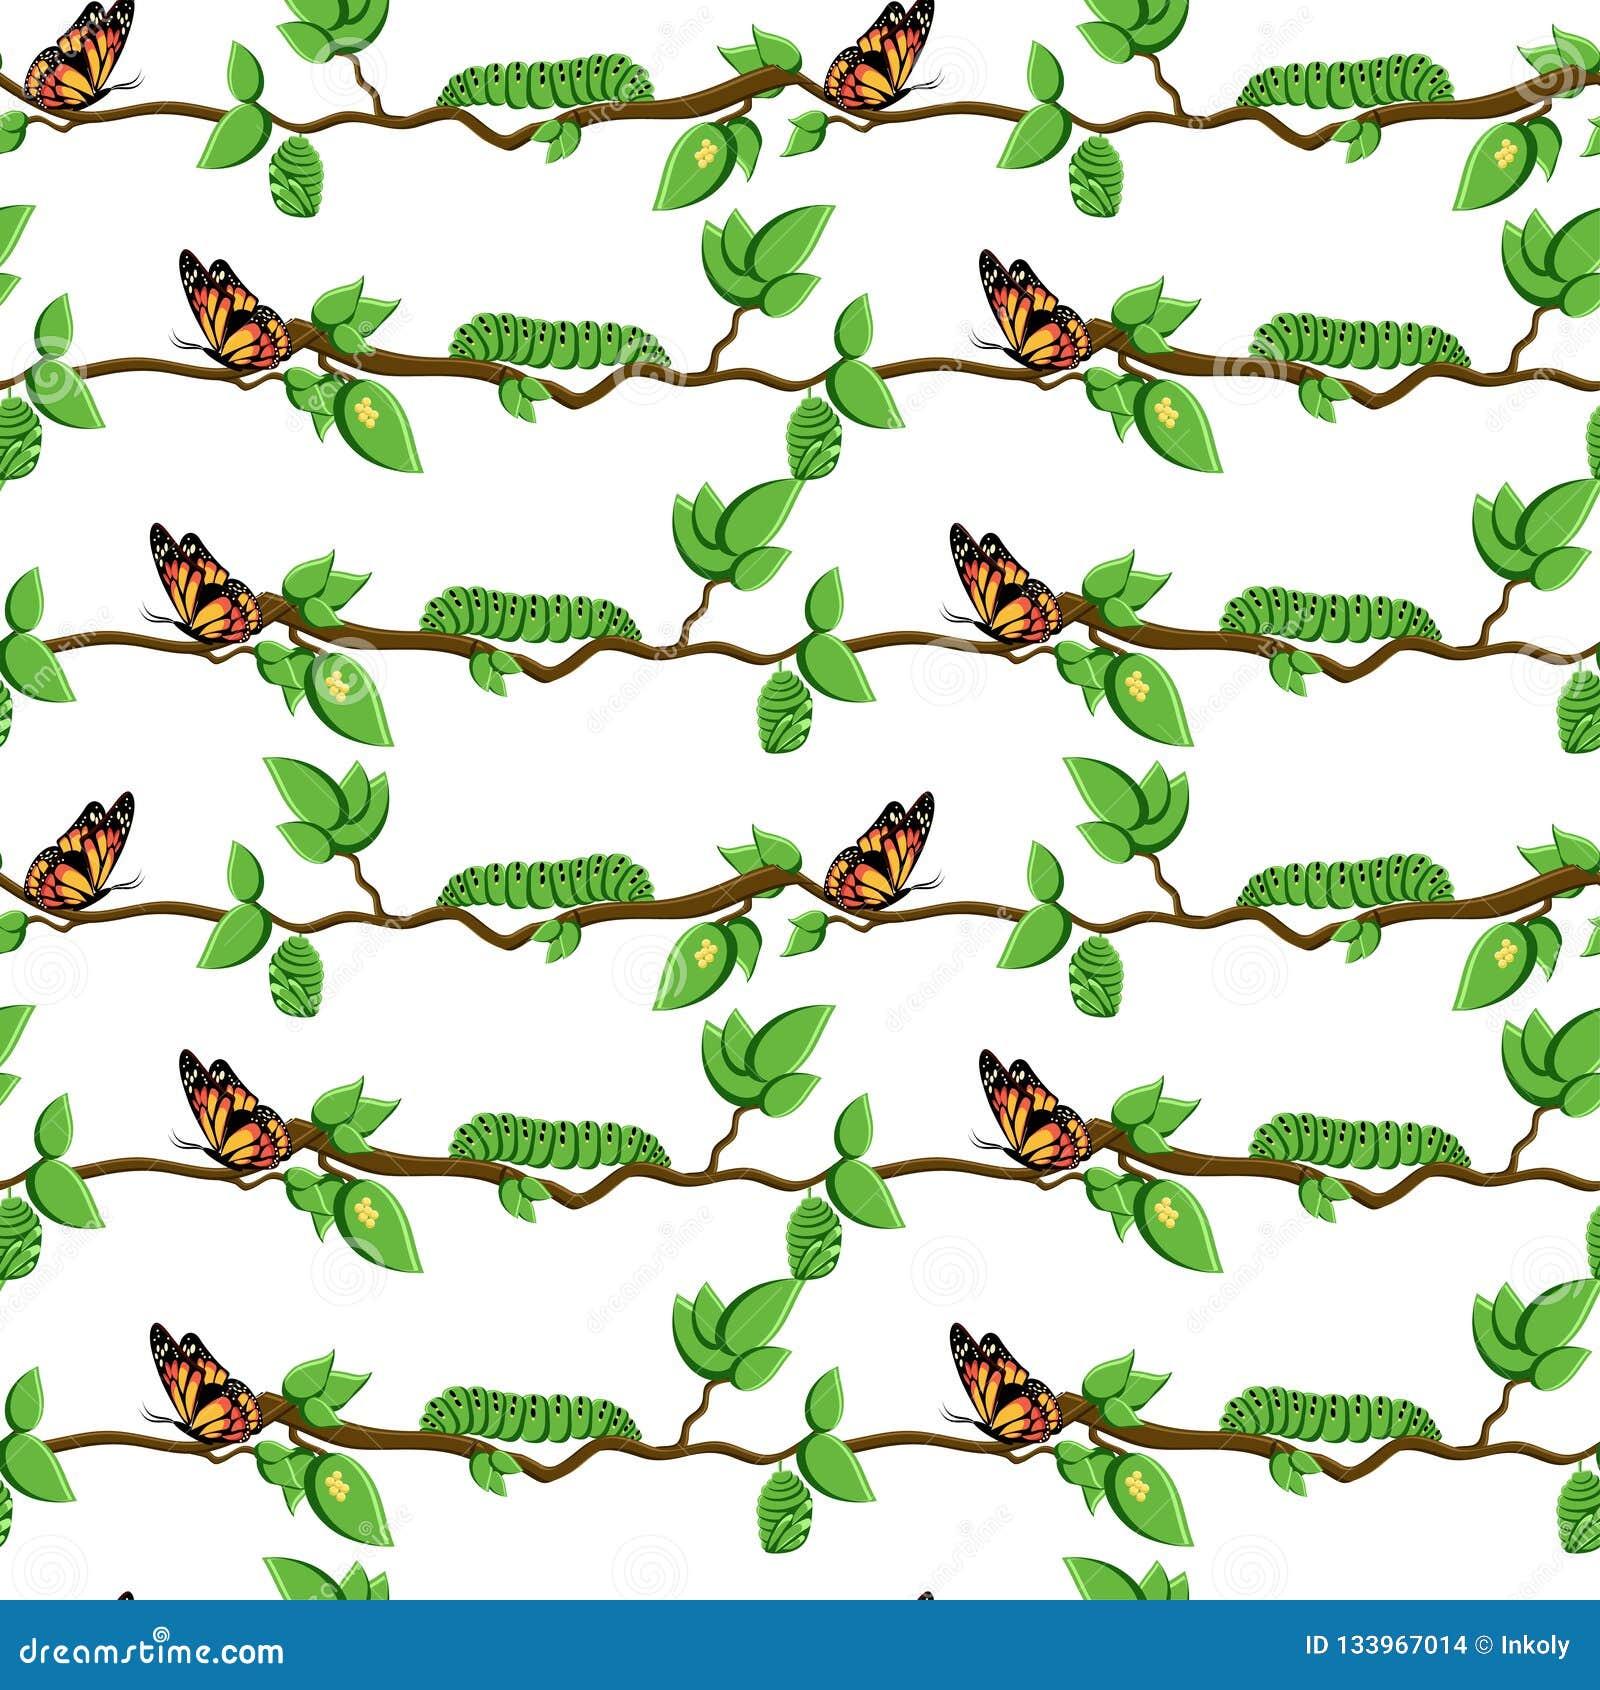 Life cycle of butterfly, metamorphosis seamless pattern